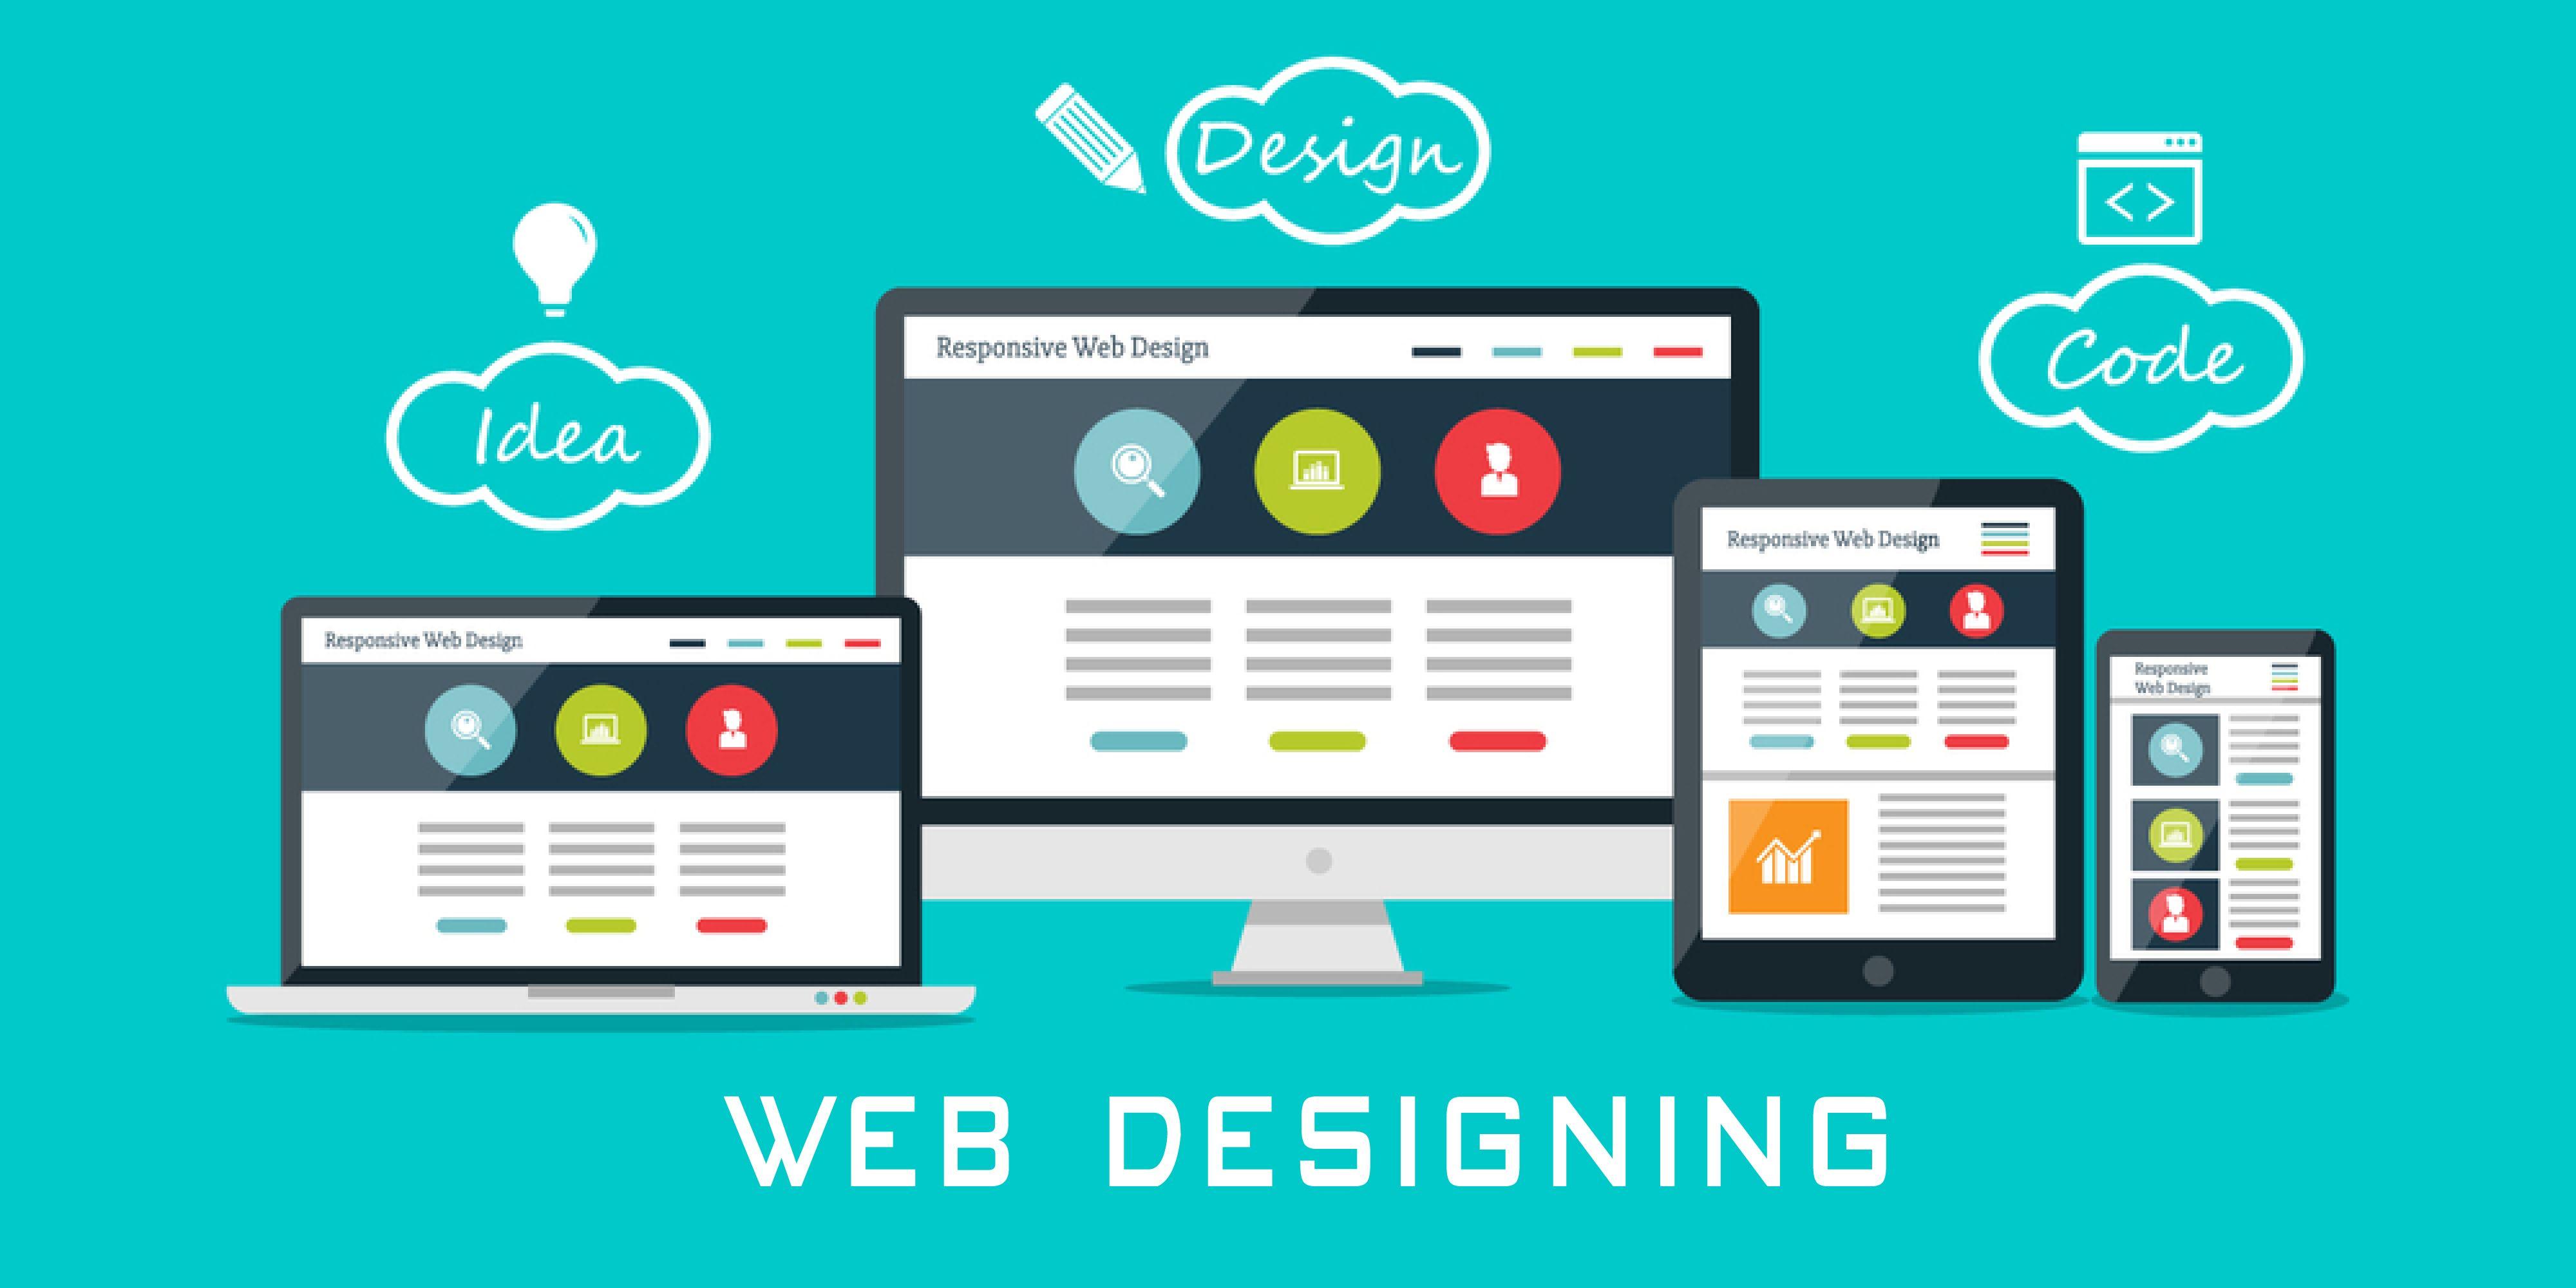 Web Designer In Manchester Hire Website Designer Small Business Web Design Business Web Design Web Design